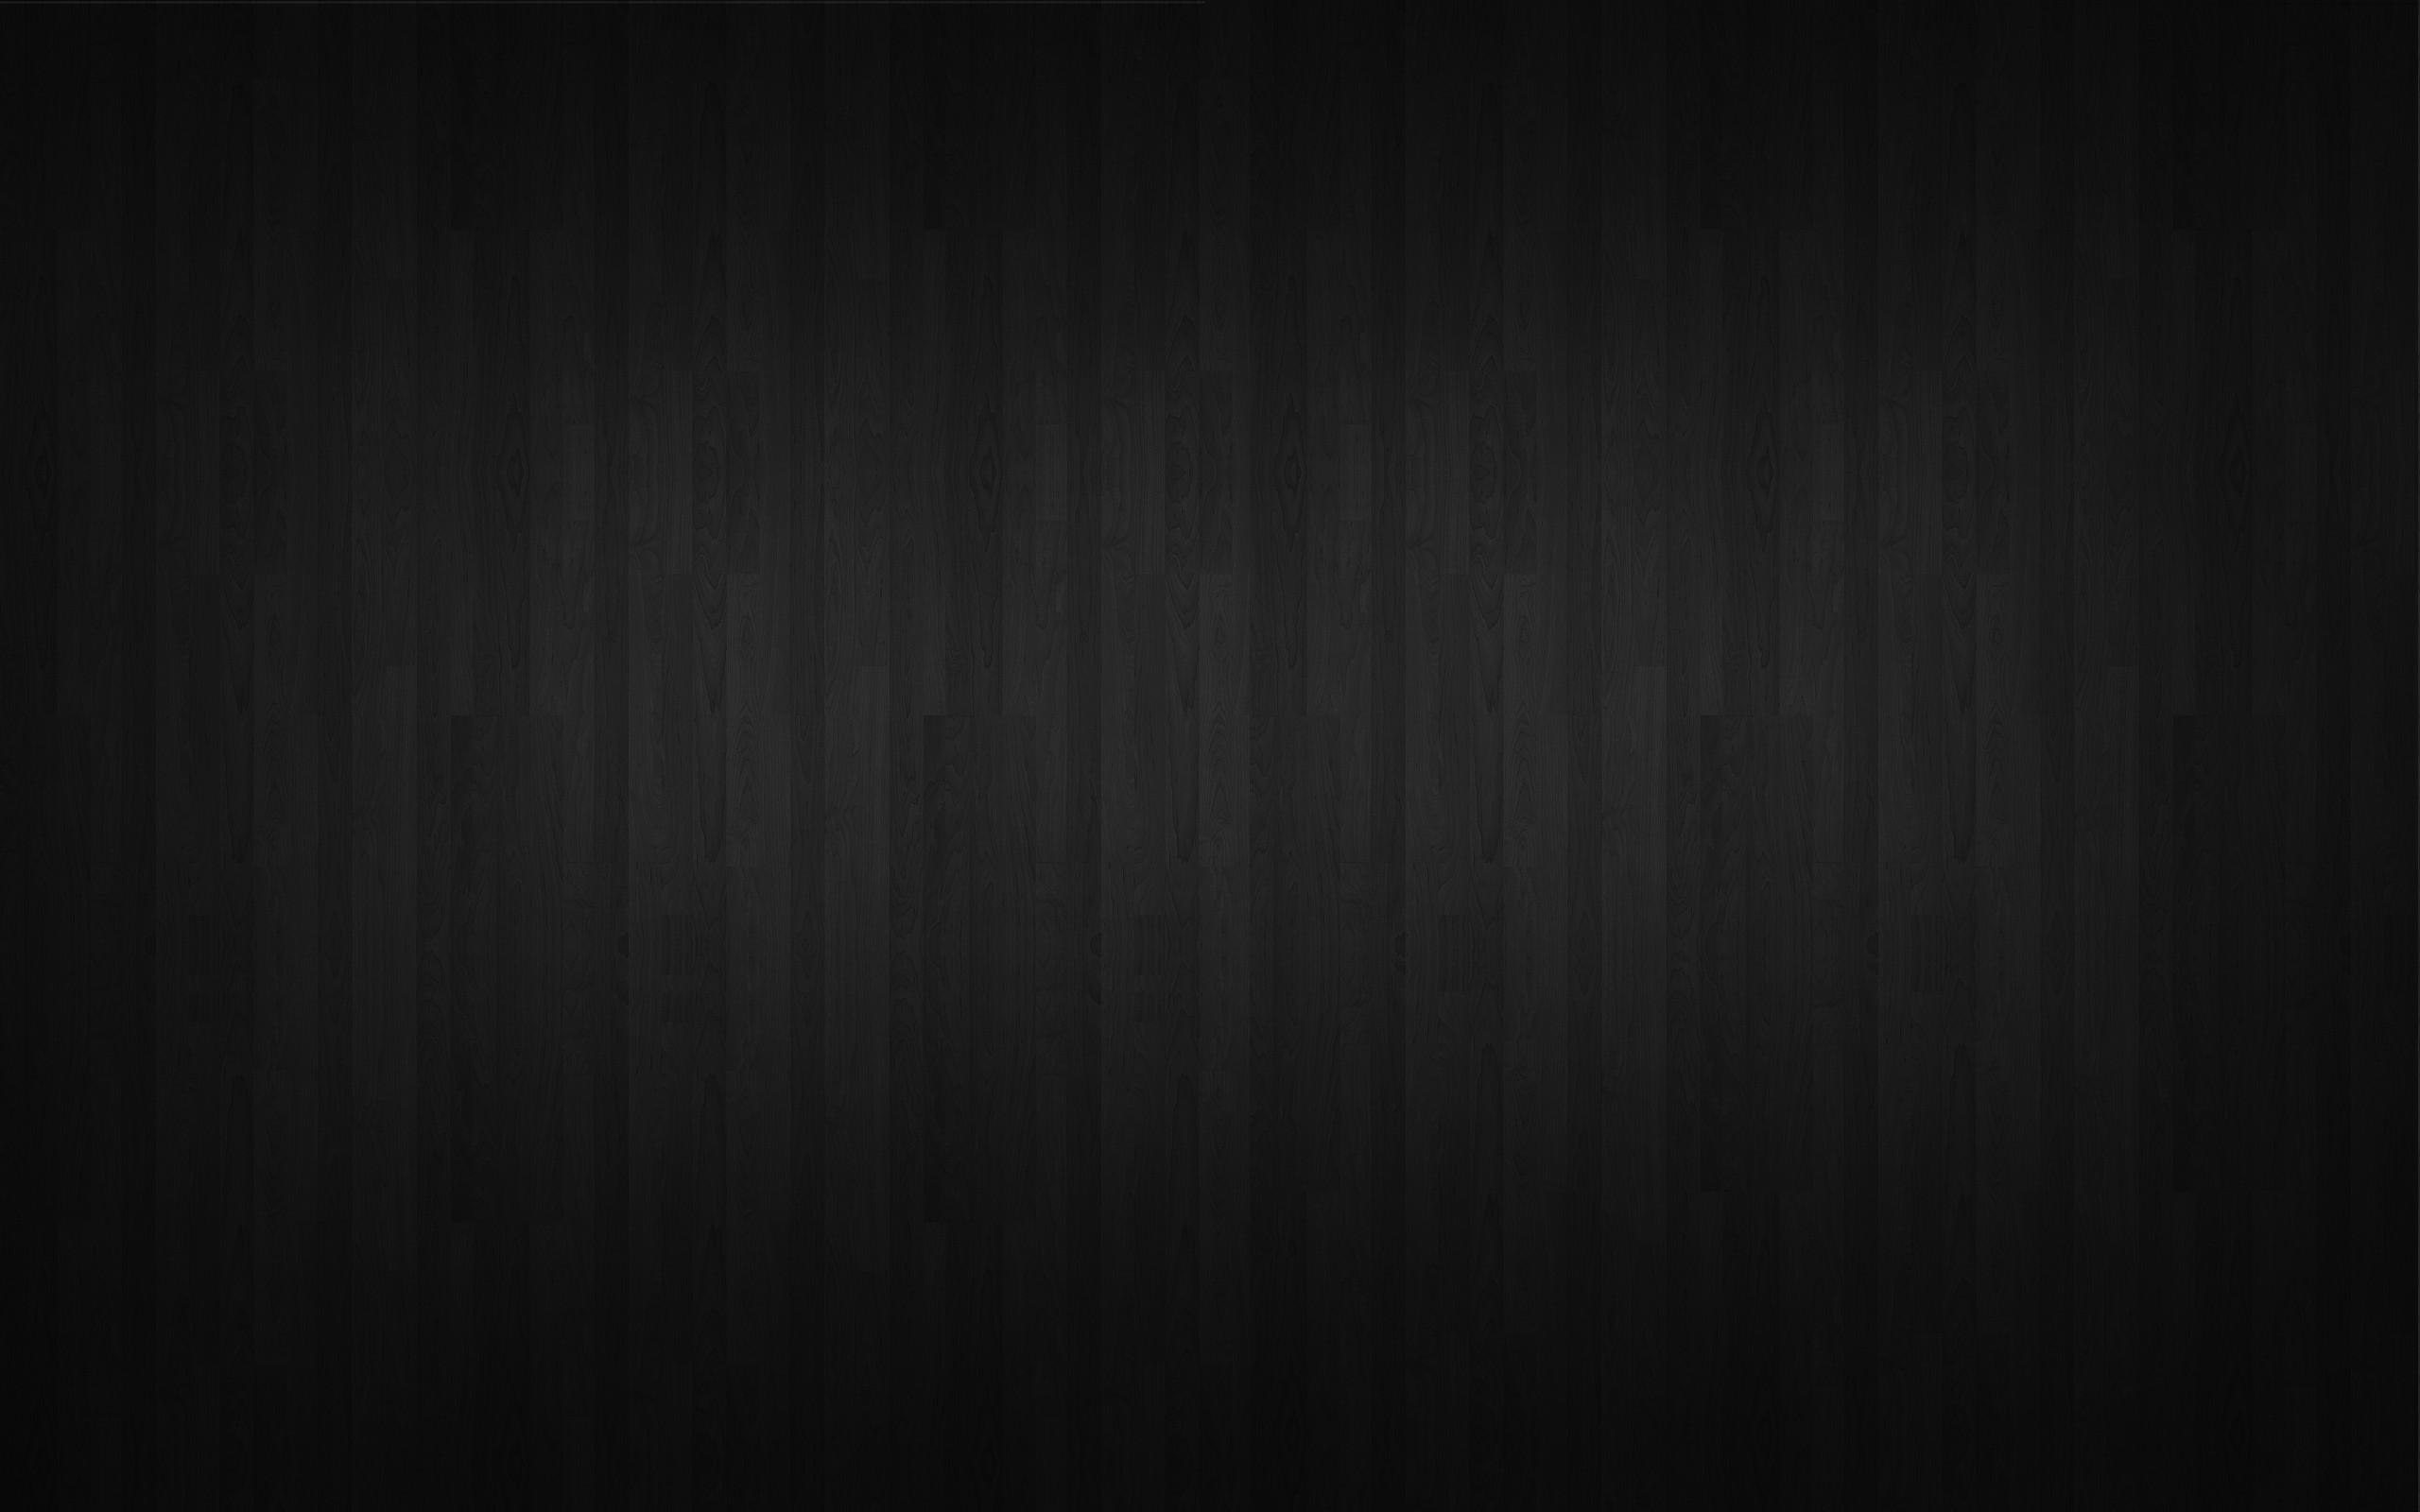 Large Black Wallpaper 1920x1200